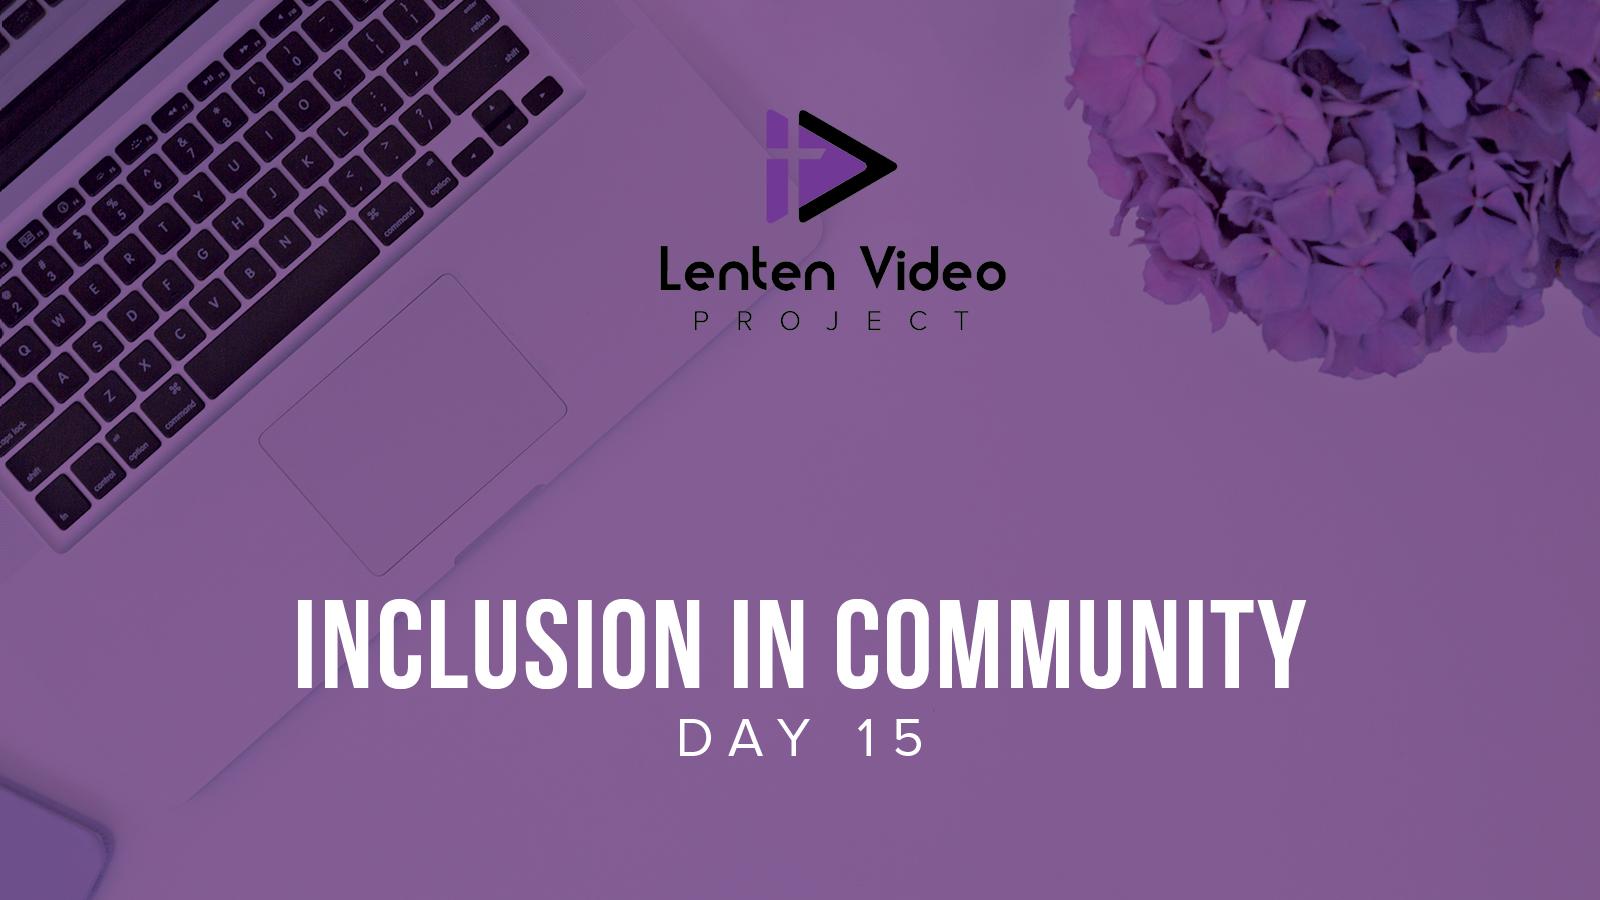 Inclusion in Community